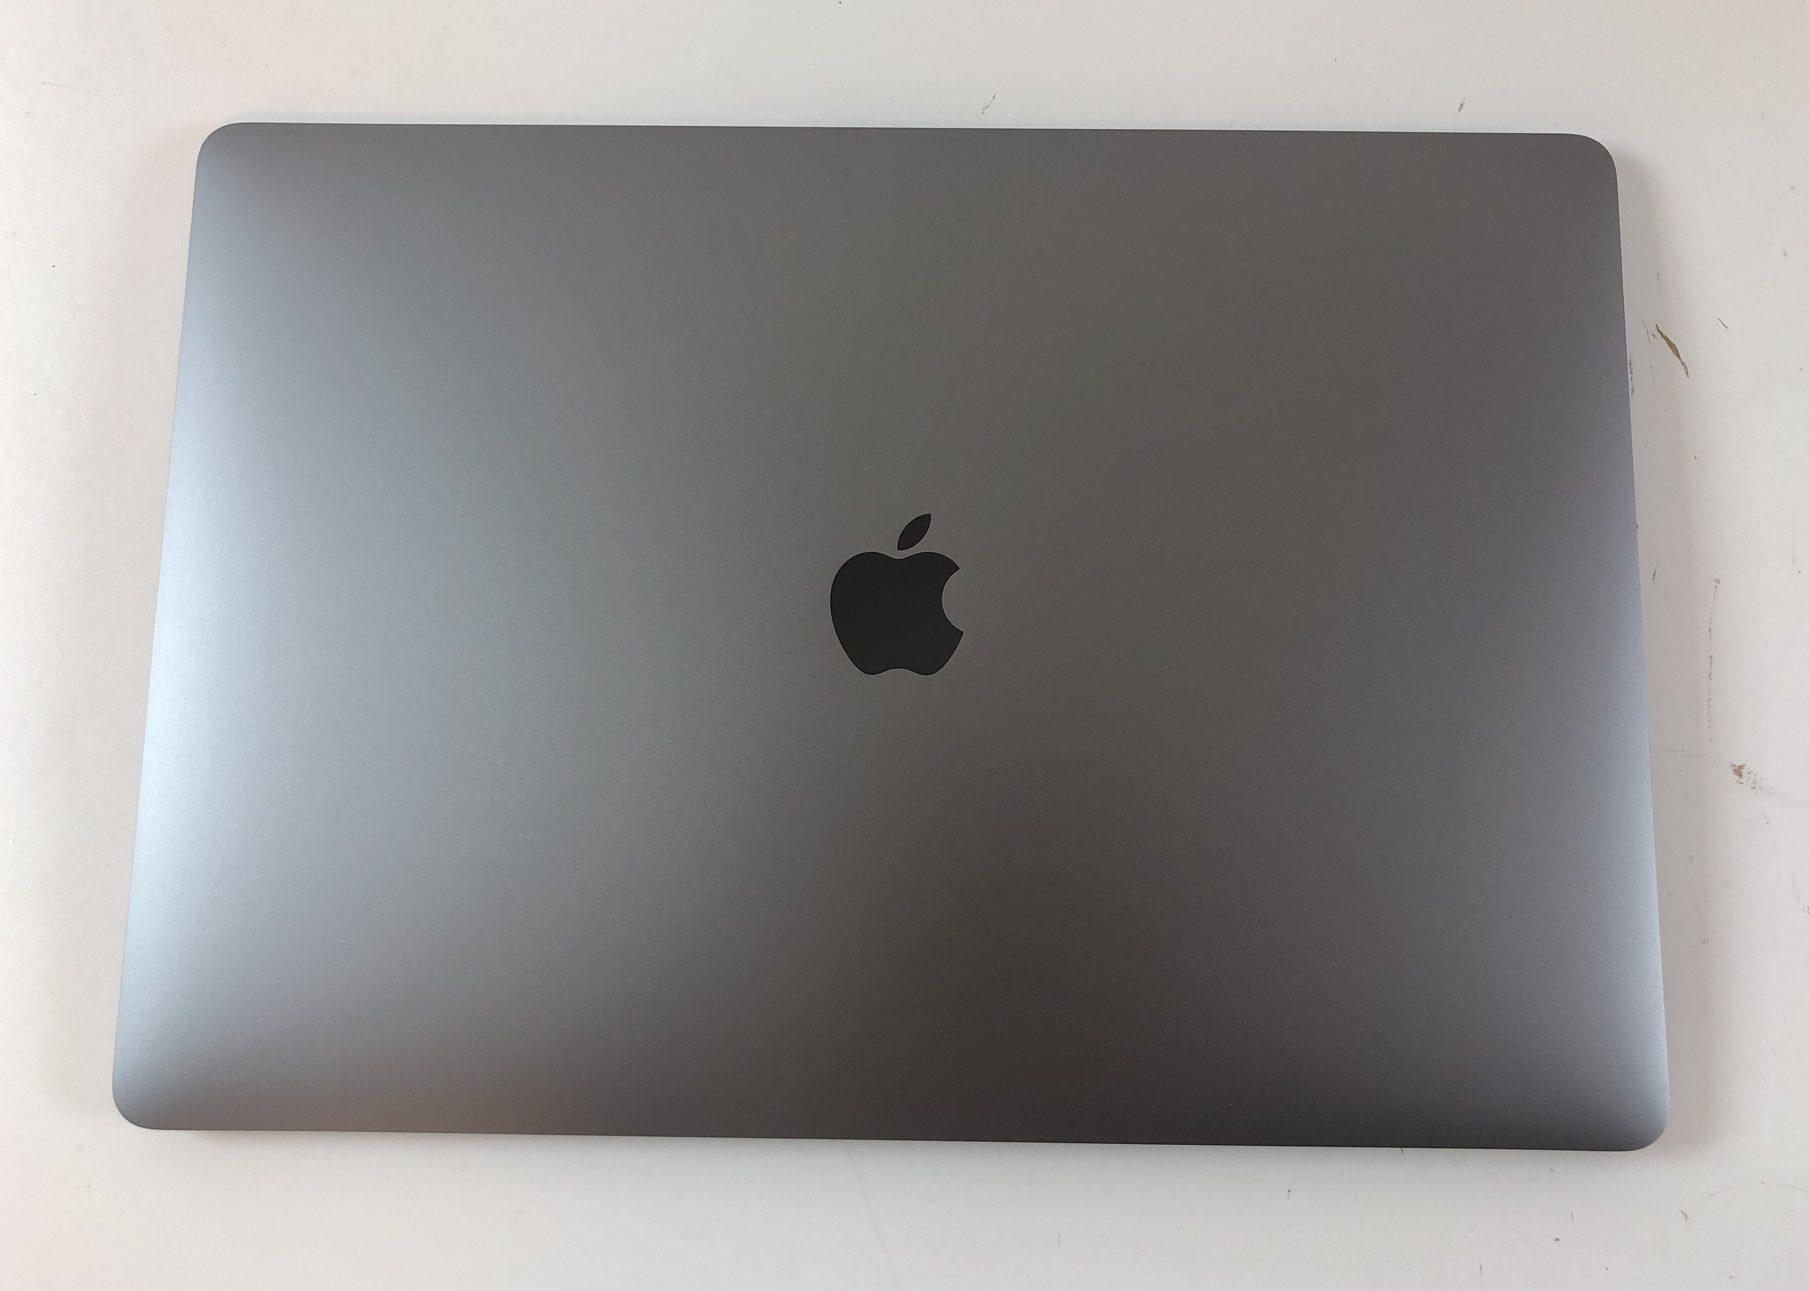 "MacBook Pro 15"" Touch Bar Mid 2017 (Intel Quad-Core i7 2.8 GHz 16 GB RAM 1 TB SSD), Space Gray, Intel Quad-Core i7 2.8 GHz, 16 GB RAM, 1 TB SSD, imagen 2"